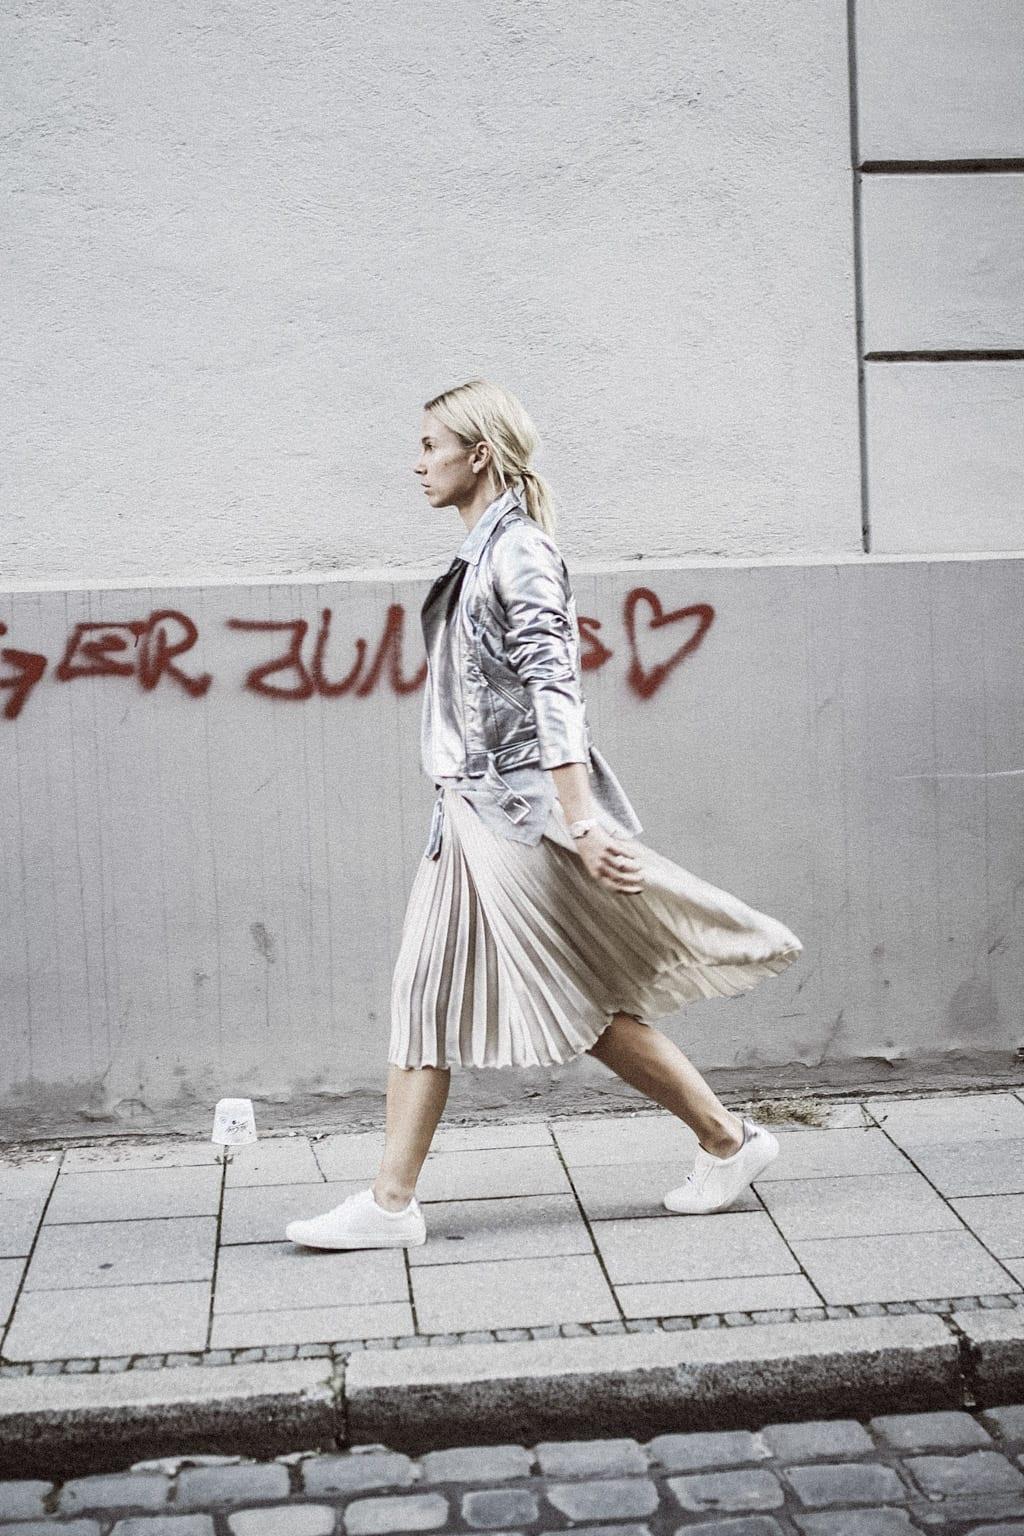 ck-constantlyk-com-karin-kaswurm-street-style-fashion-silver-leather-jacket-plissee-6842